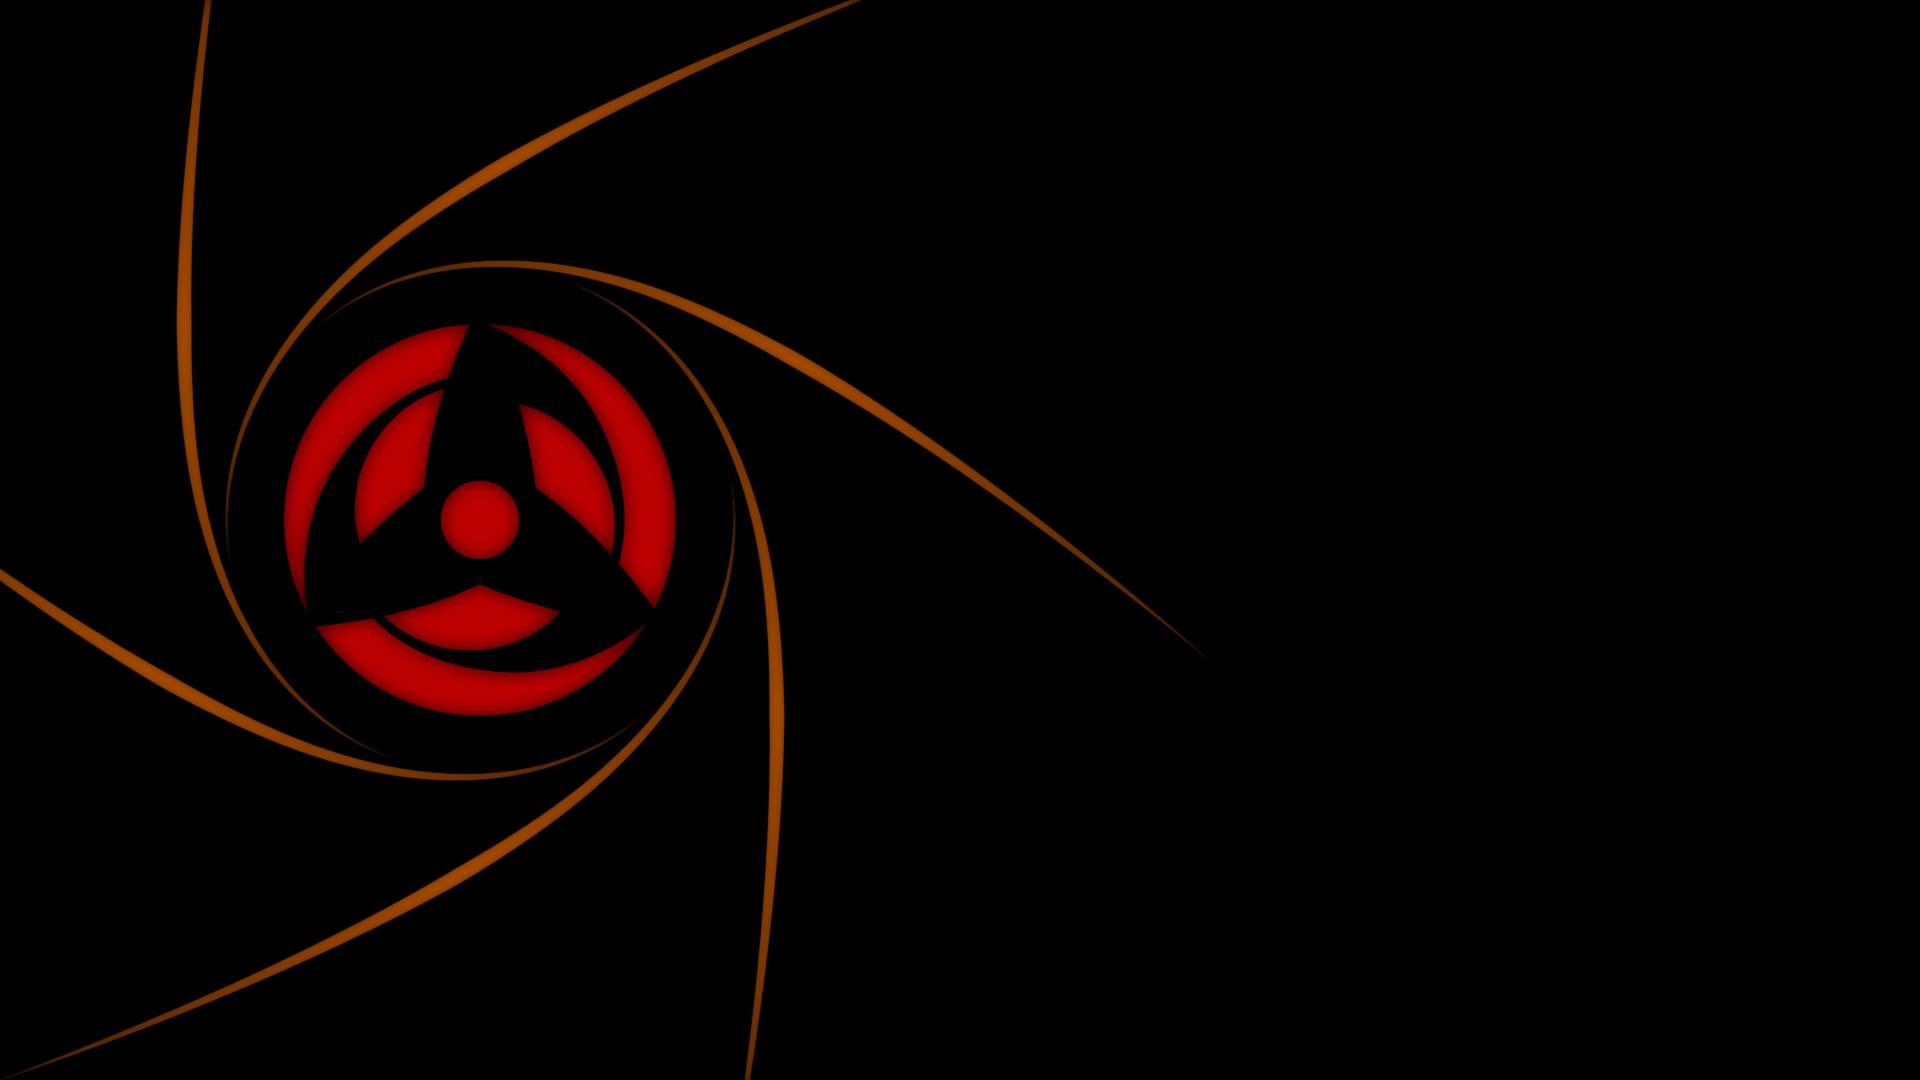 Hd Nature Wallpaper For Android Phone Download 1920x1080 Sharingan Obito Naruto Wallpapers For